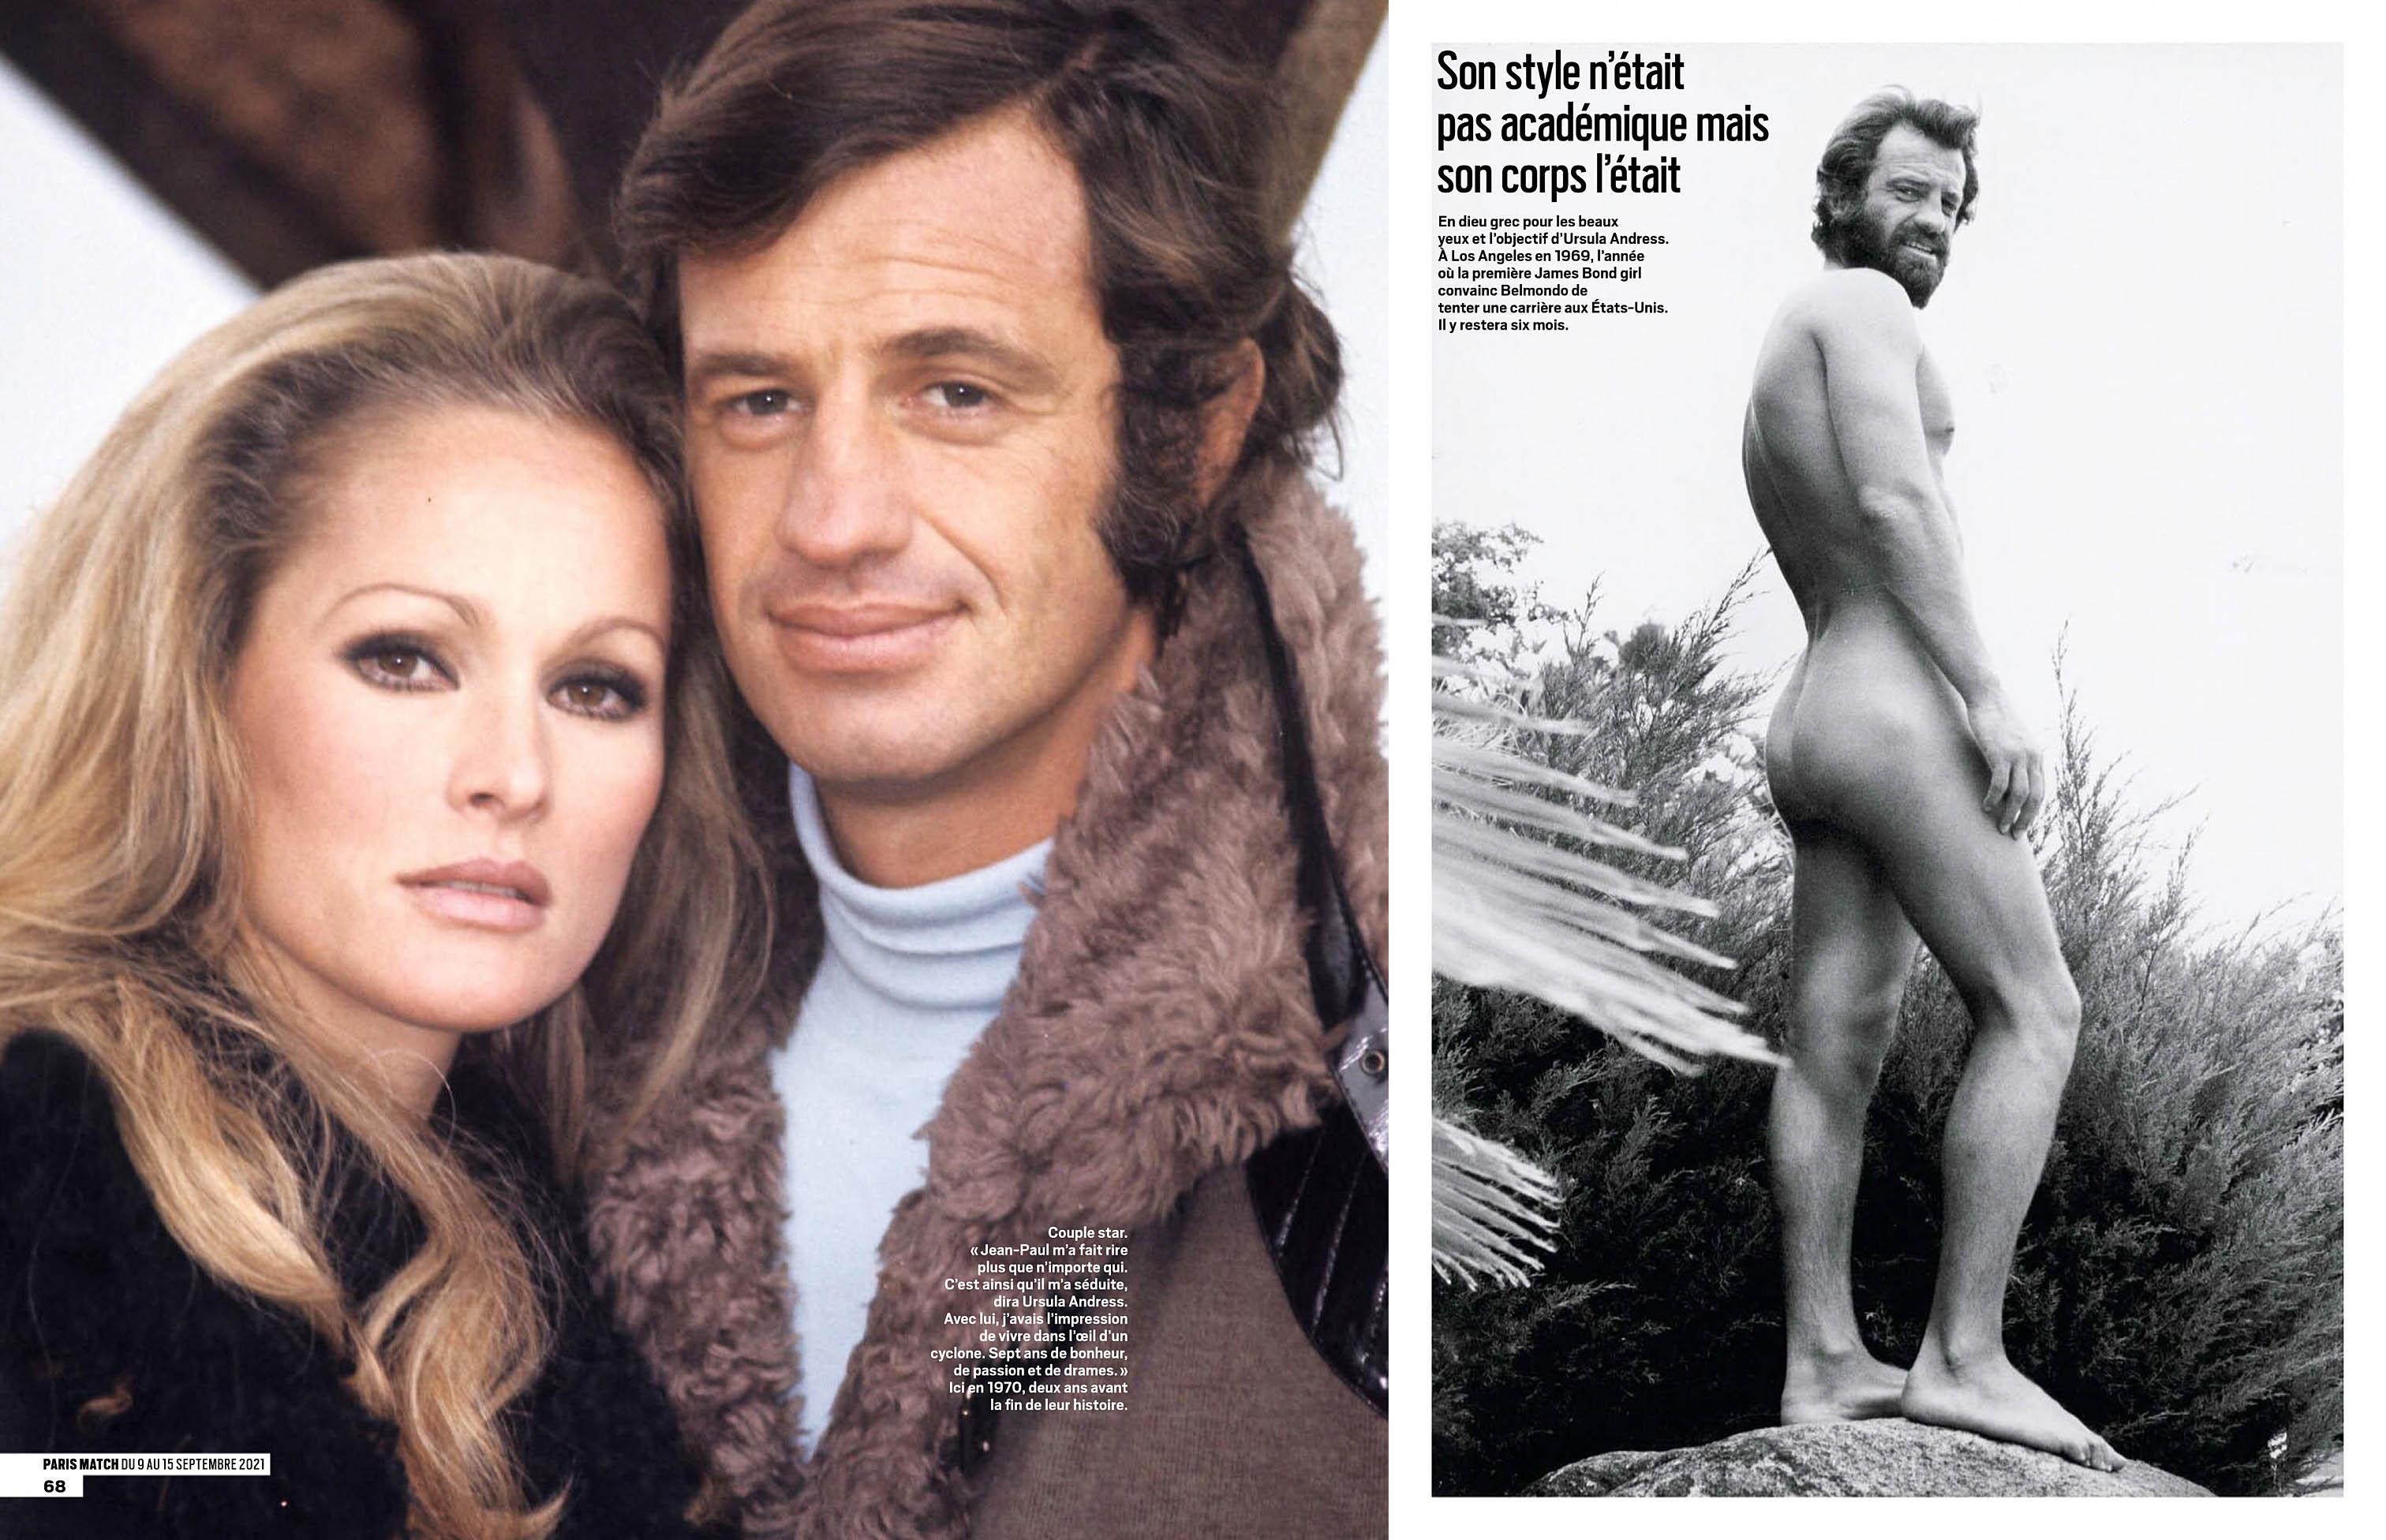 Paris Match 210909 Belmondo 11.jpg